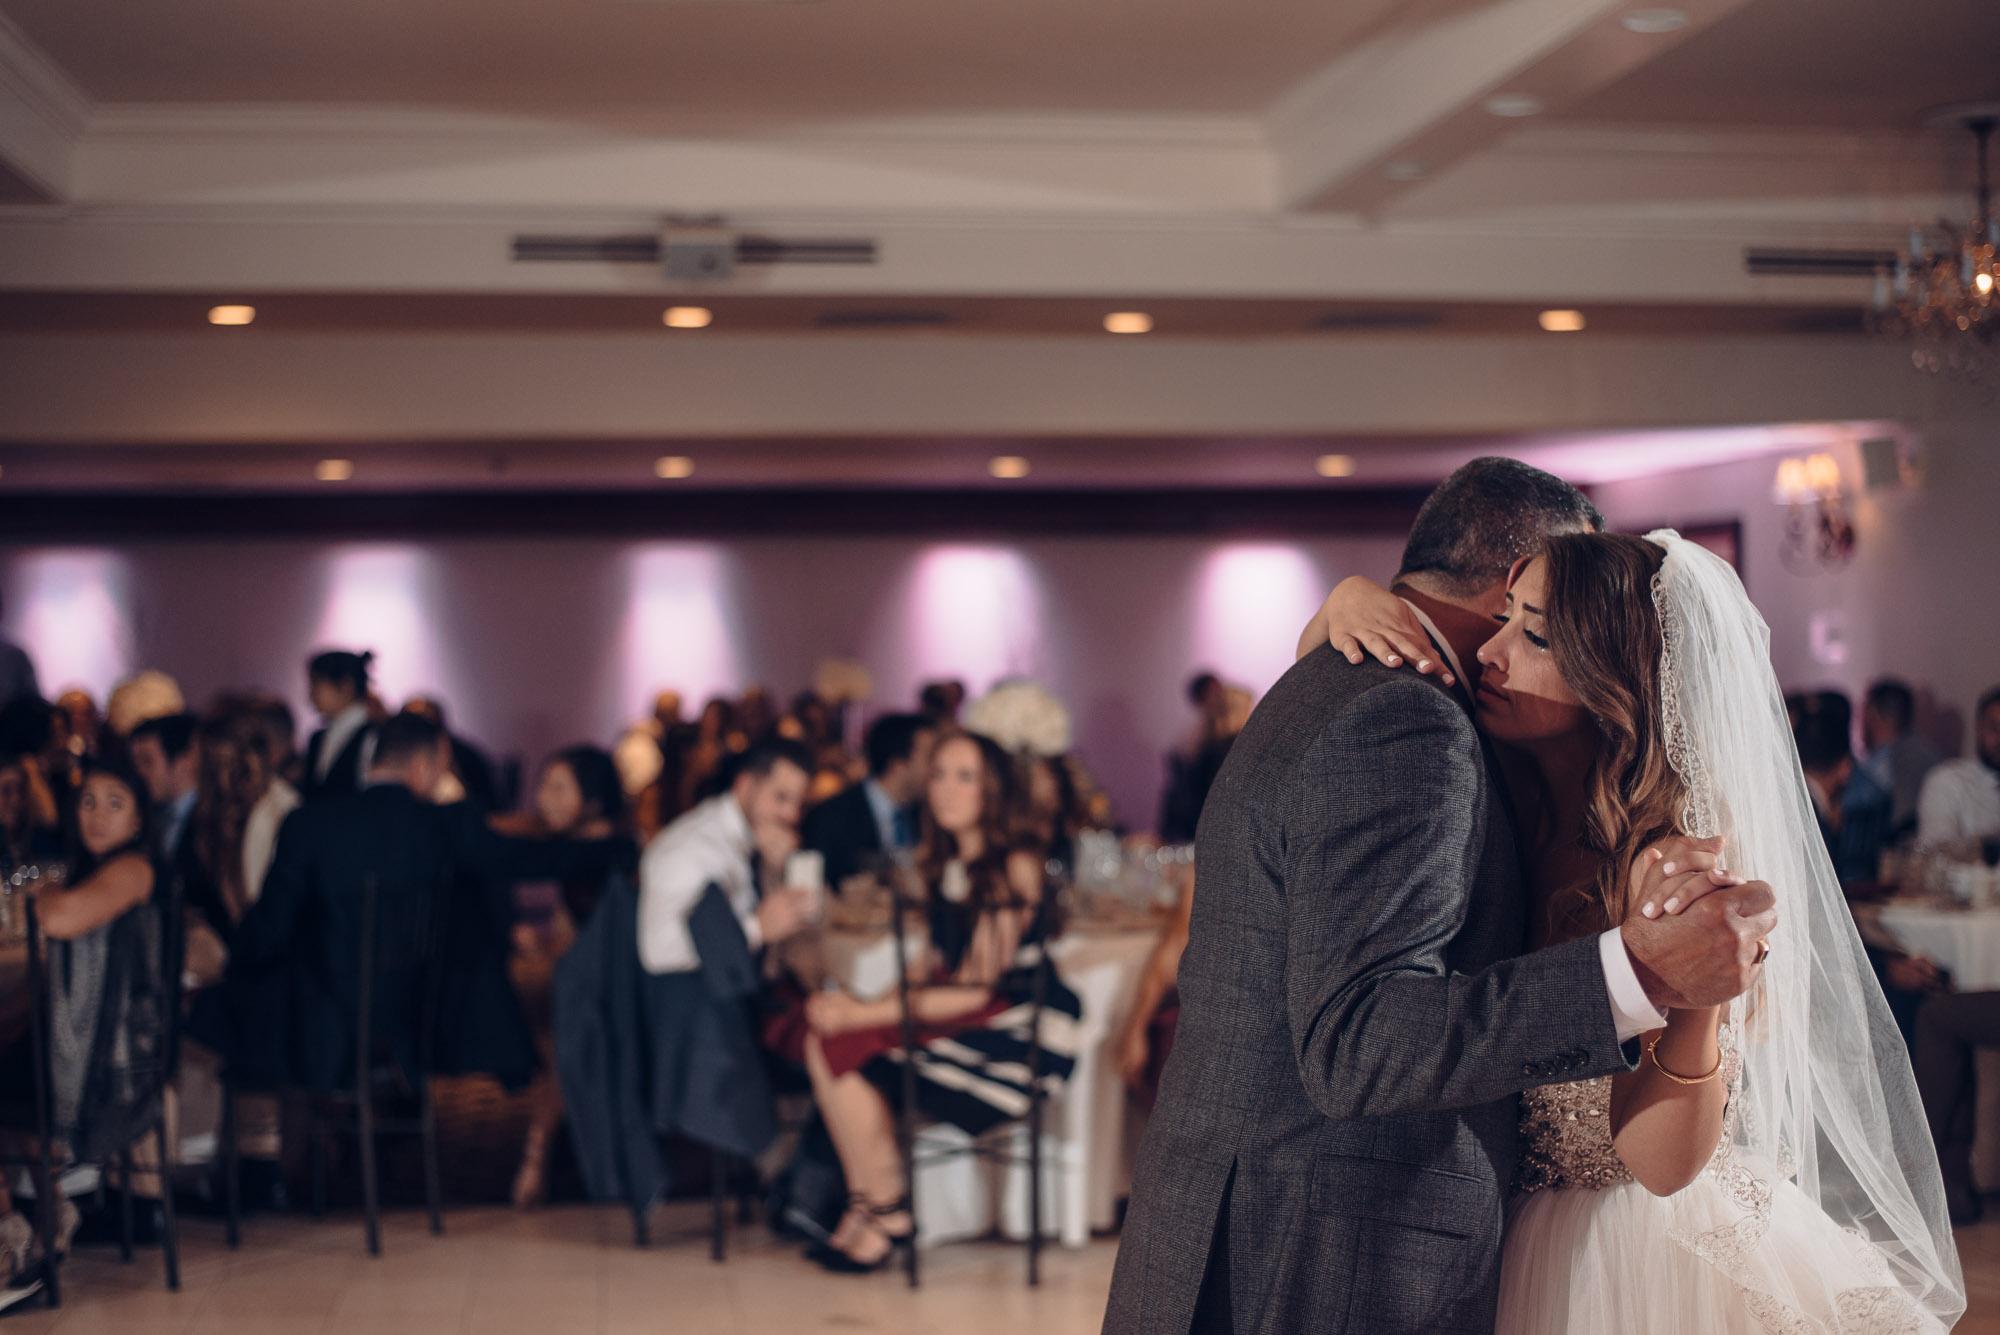 woodwinds_wedding_171020_web-54.jpg